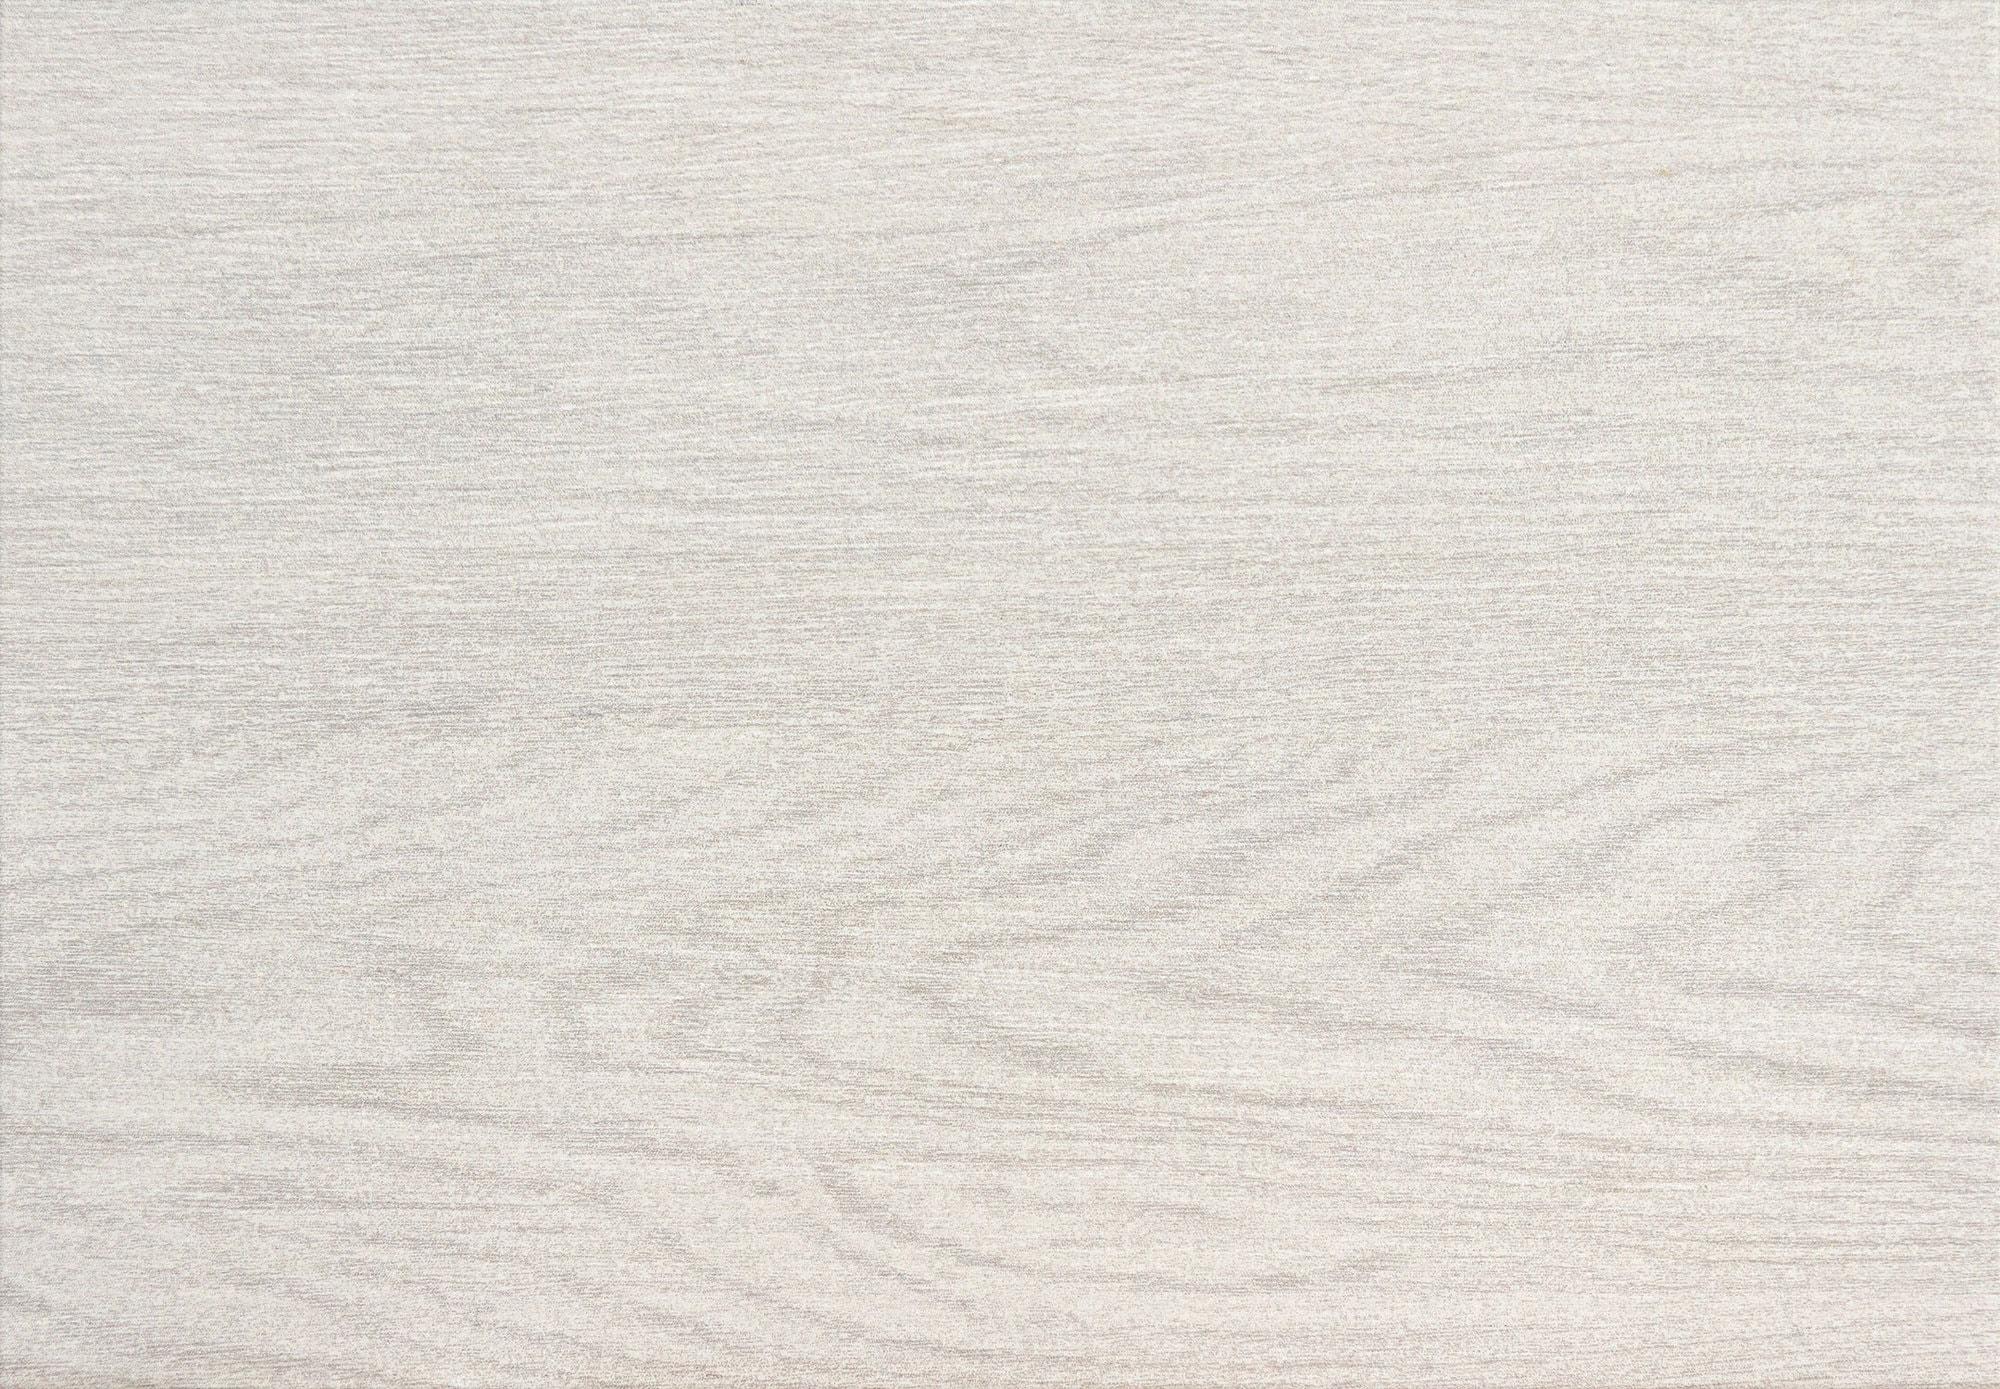 Płytka ścienna Domino Inverno White 25x36cm domInvWhi25x36